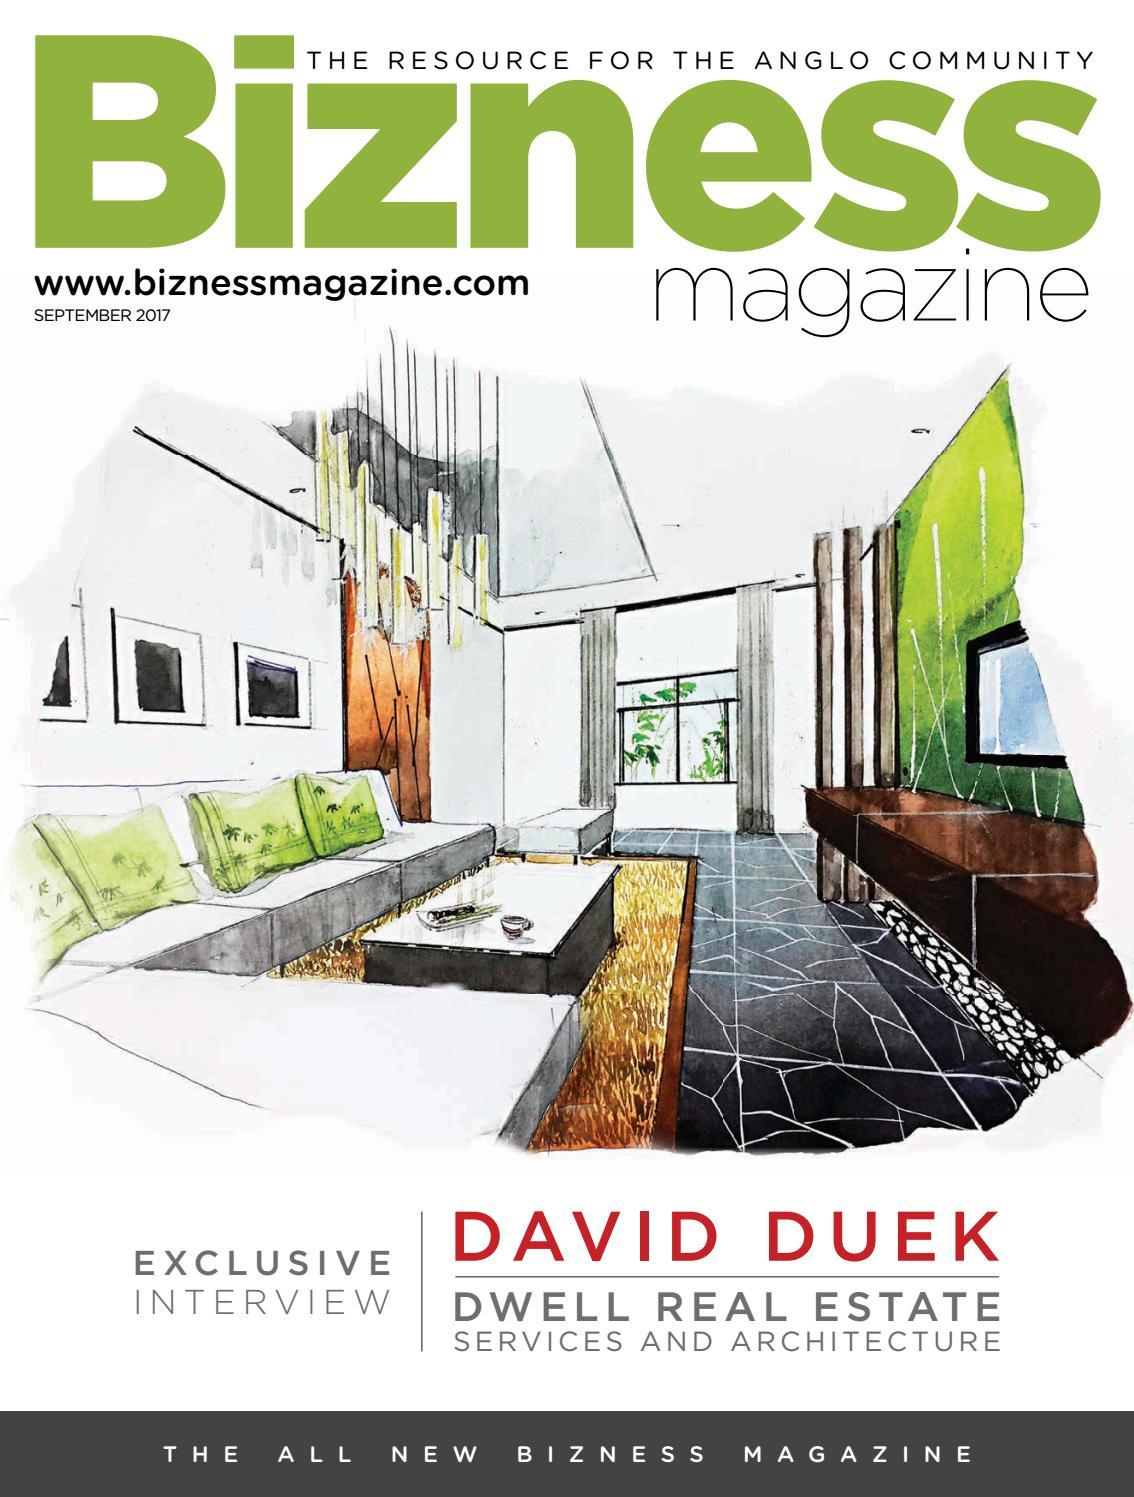 Bizness magazine september 2017 by bizness magazine issuu malvernweather Images